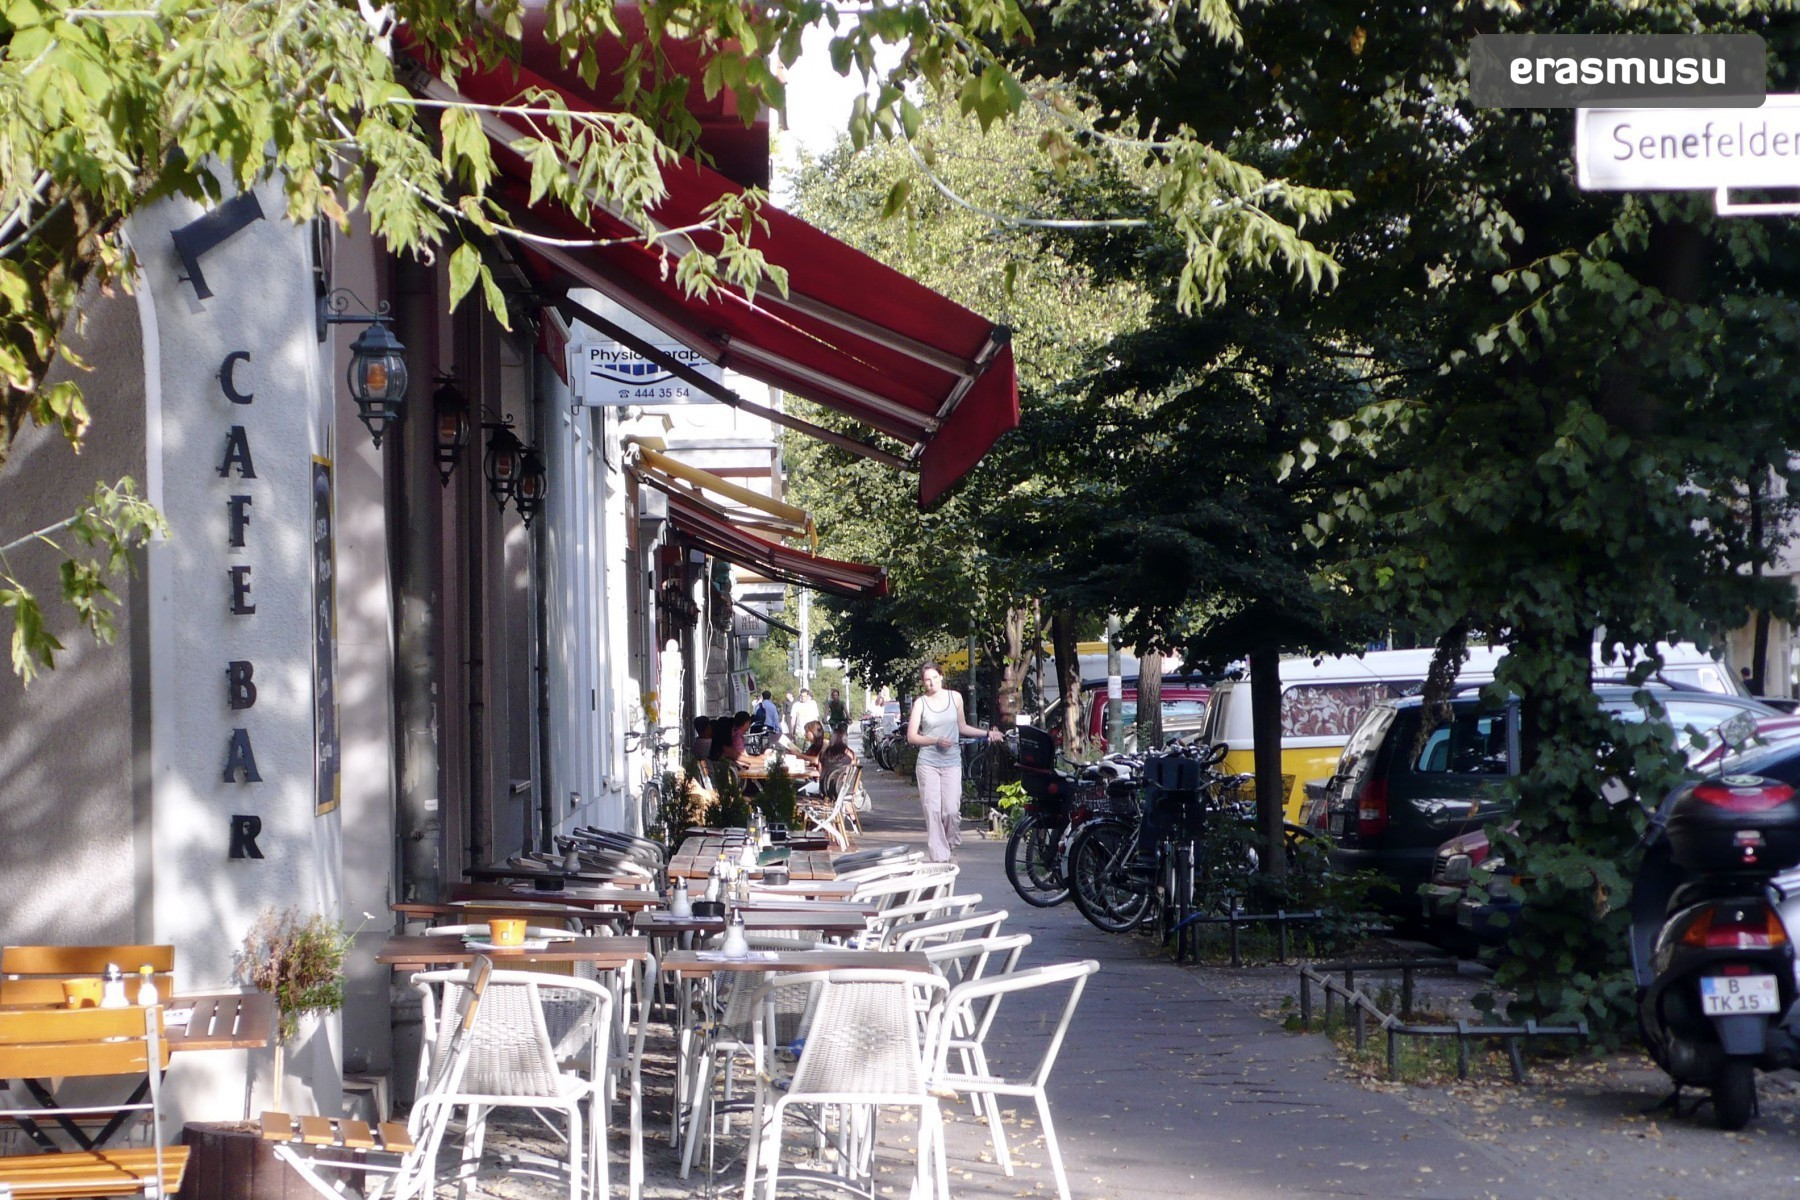 Raumerstraße 19, 10437 Berlin, Germany